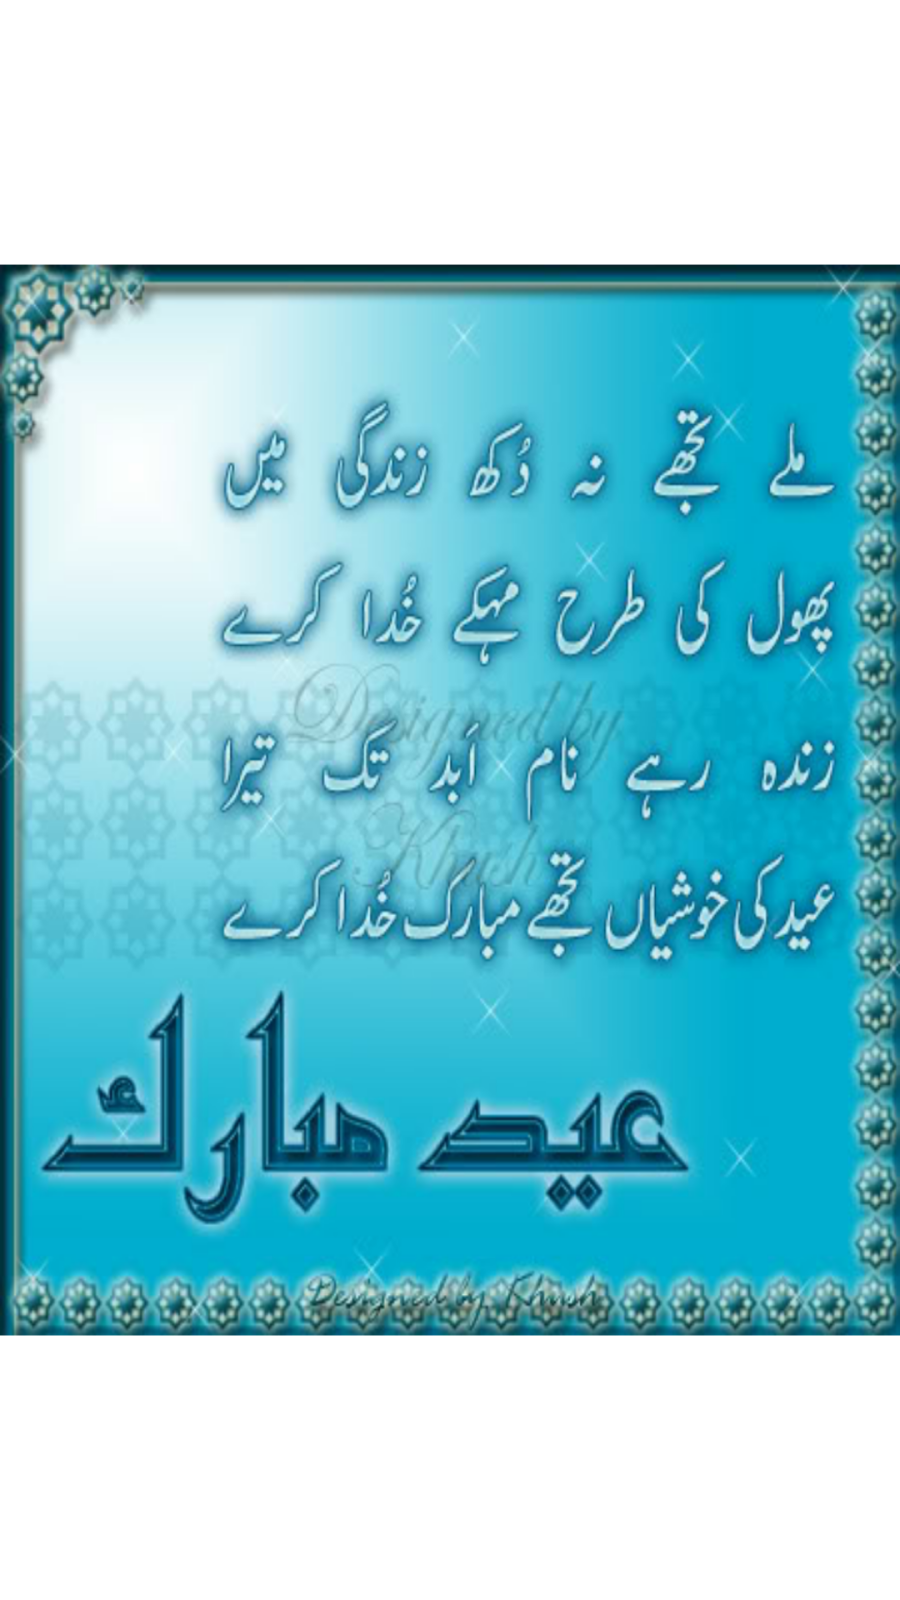 Mily tumjhy na dukh zindagi mei urdu eid mubarak poetry dua for mily tumjhy na dukh zindagi mei urdu eid mubarak poetry dua for eid m4hsunfo